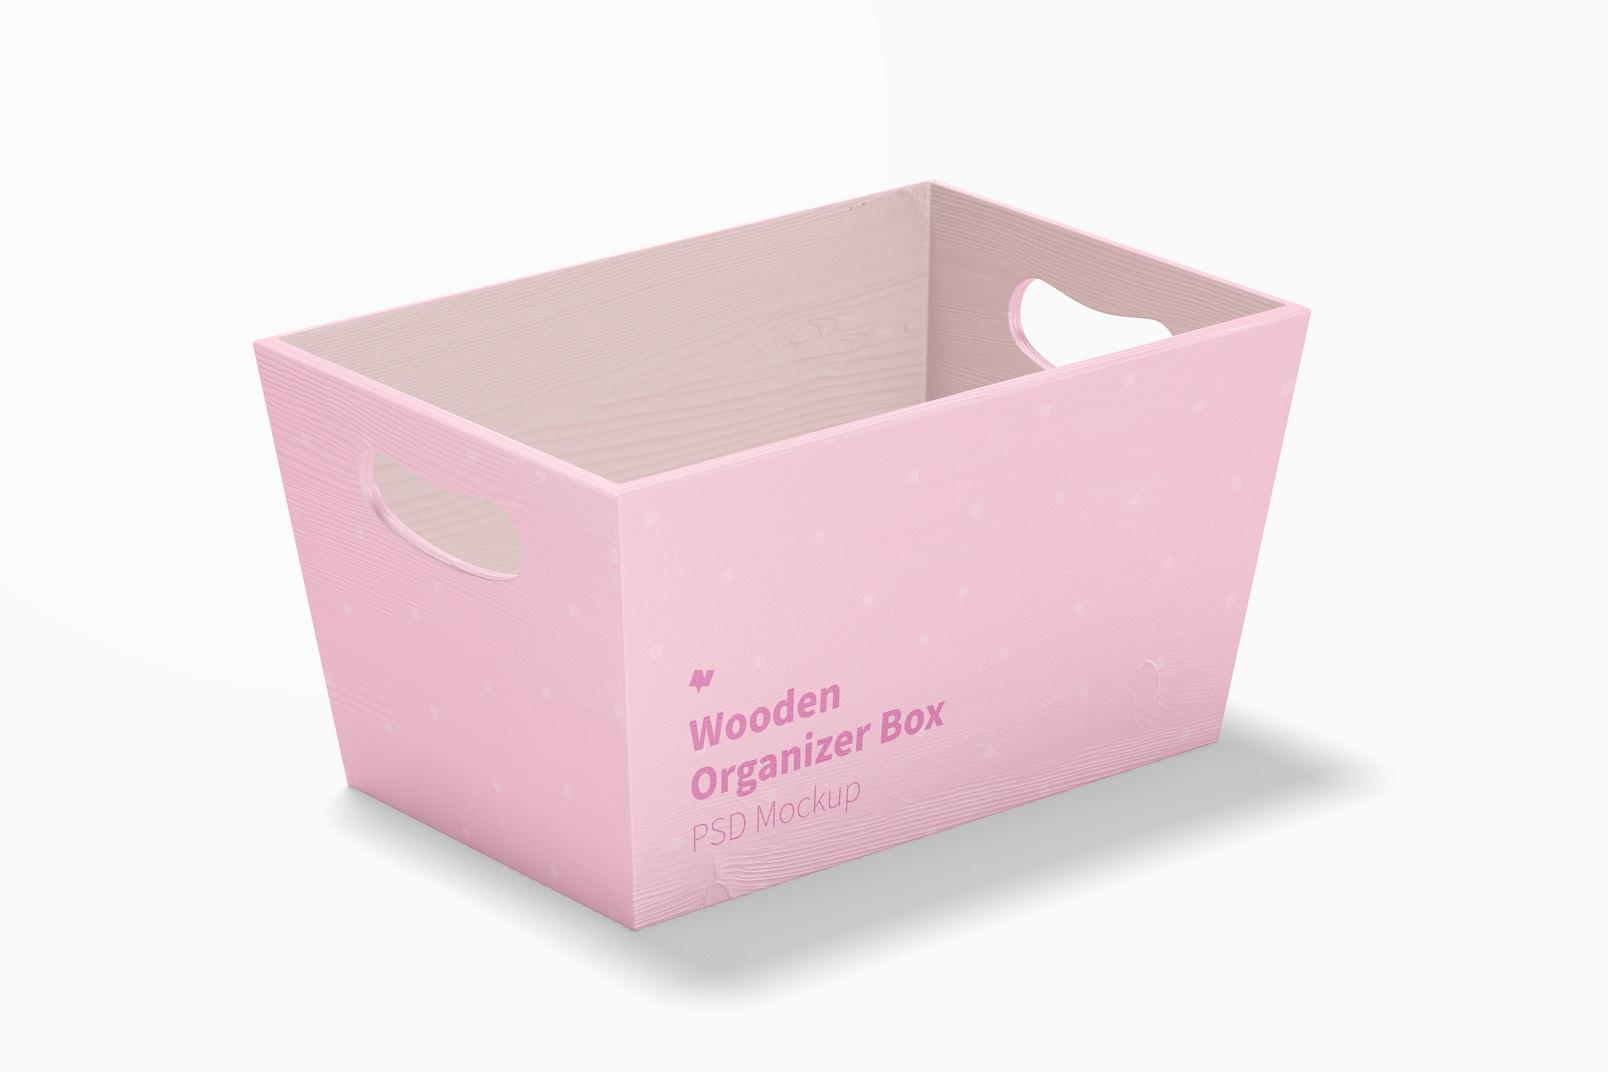 Wooden Organizer Box Mockup, Perspective